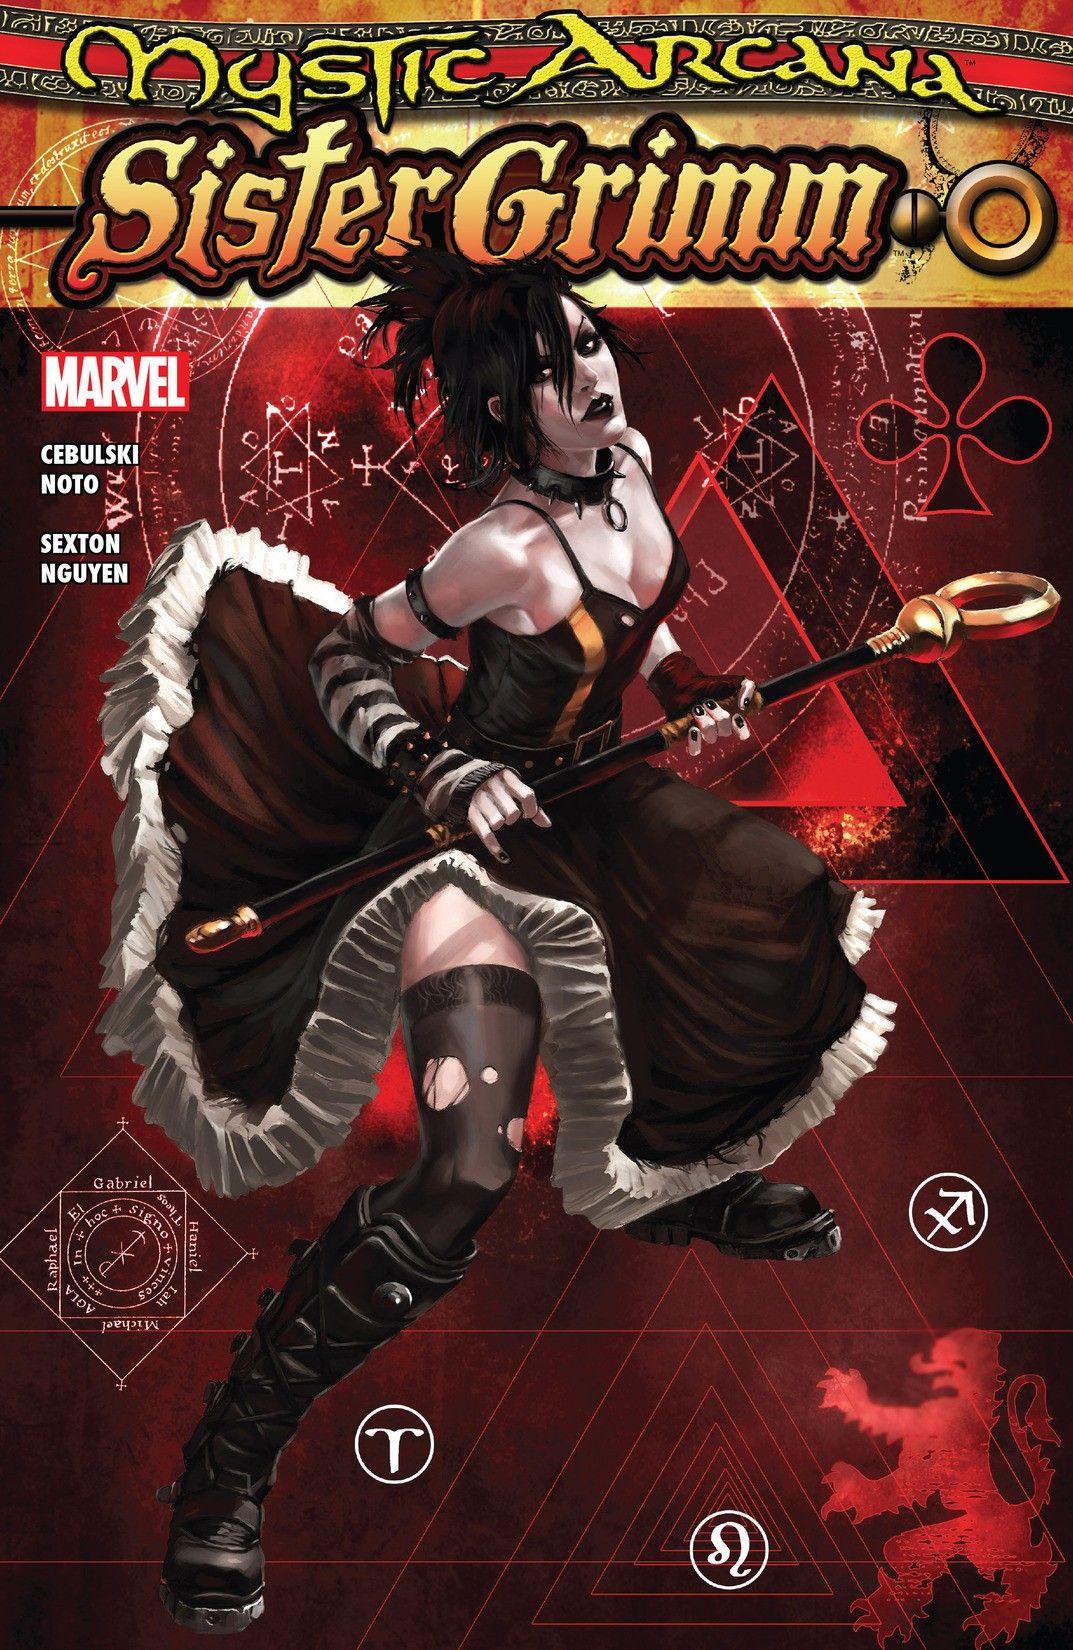 Mystic Arcana Sister Grimm #1